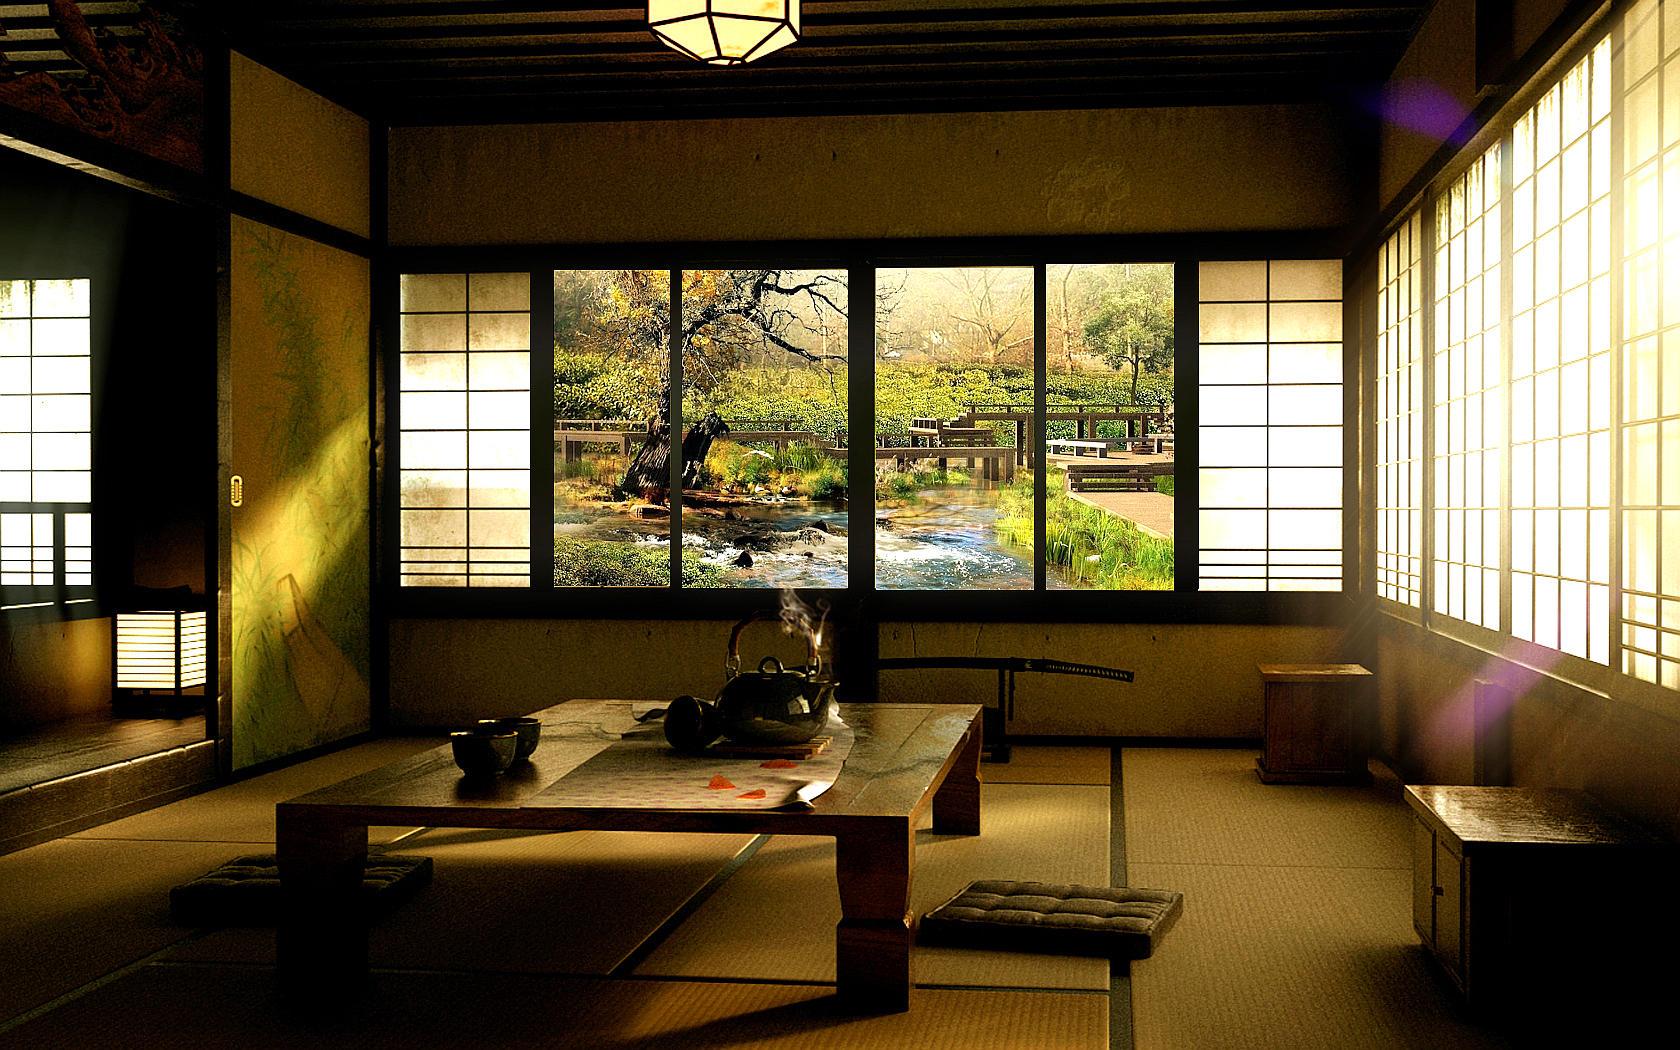 Domek IV Japan_room_by_mah310-d39yo5l